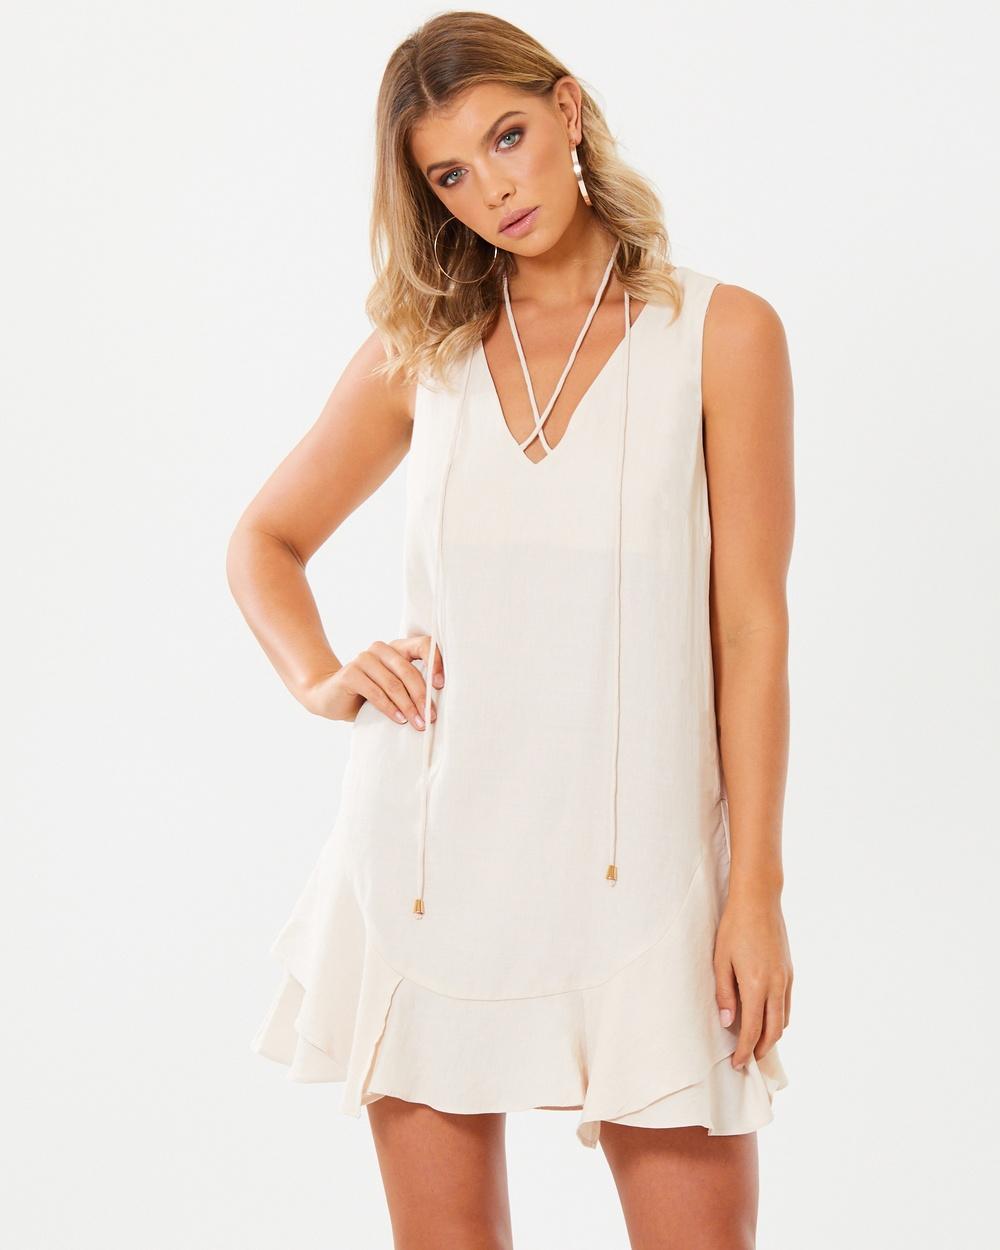 Tussah Carina Tie Neck Dress Dresses Sand Carina Tie-Neck Dress